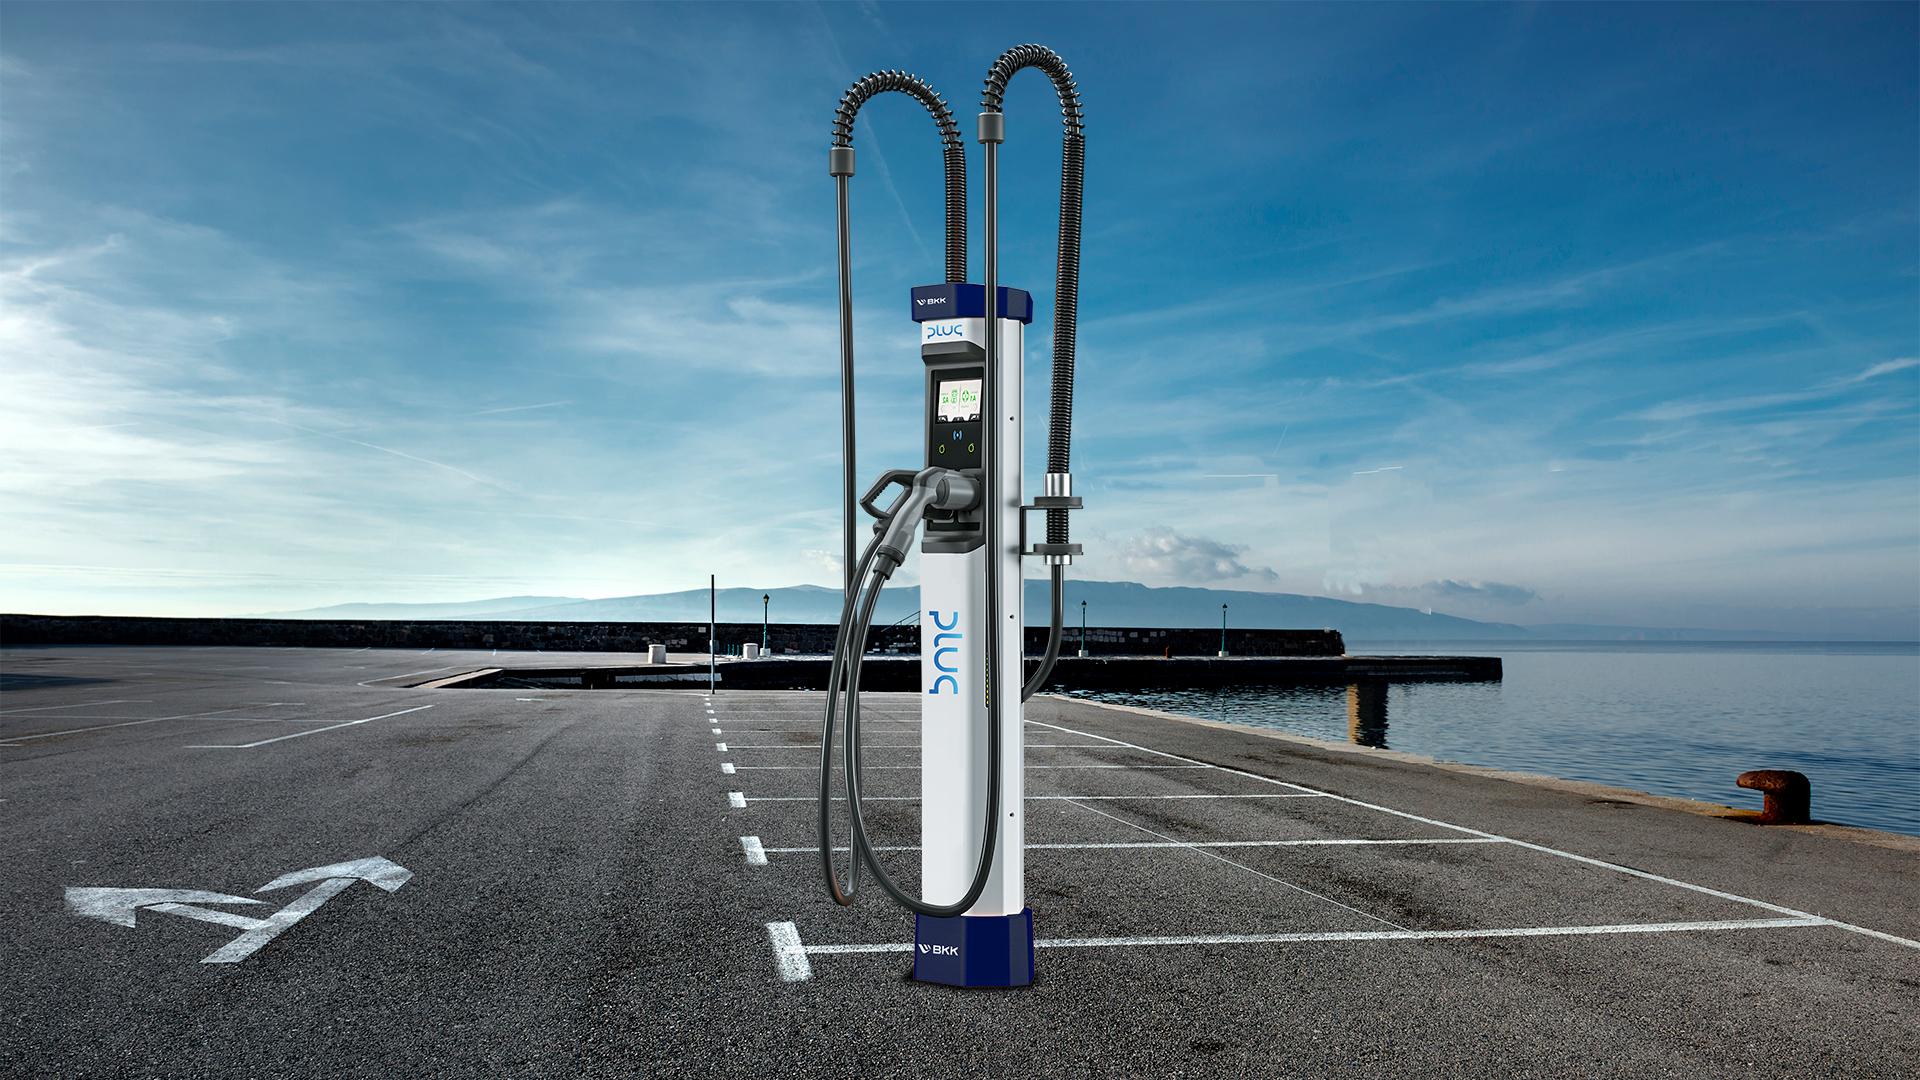 Image of the BKK Plug Boat Supercharger